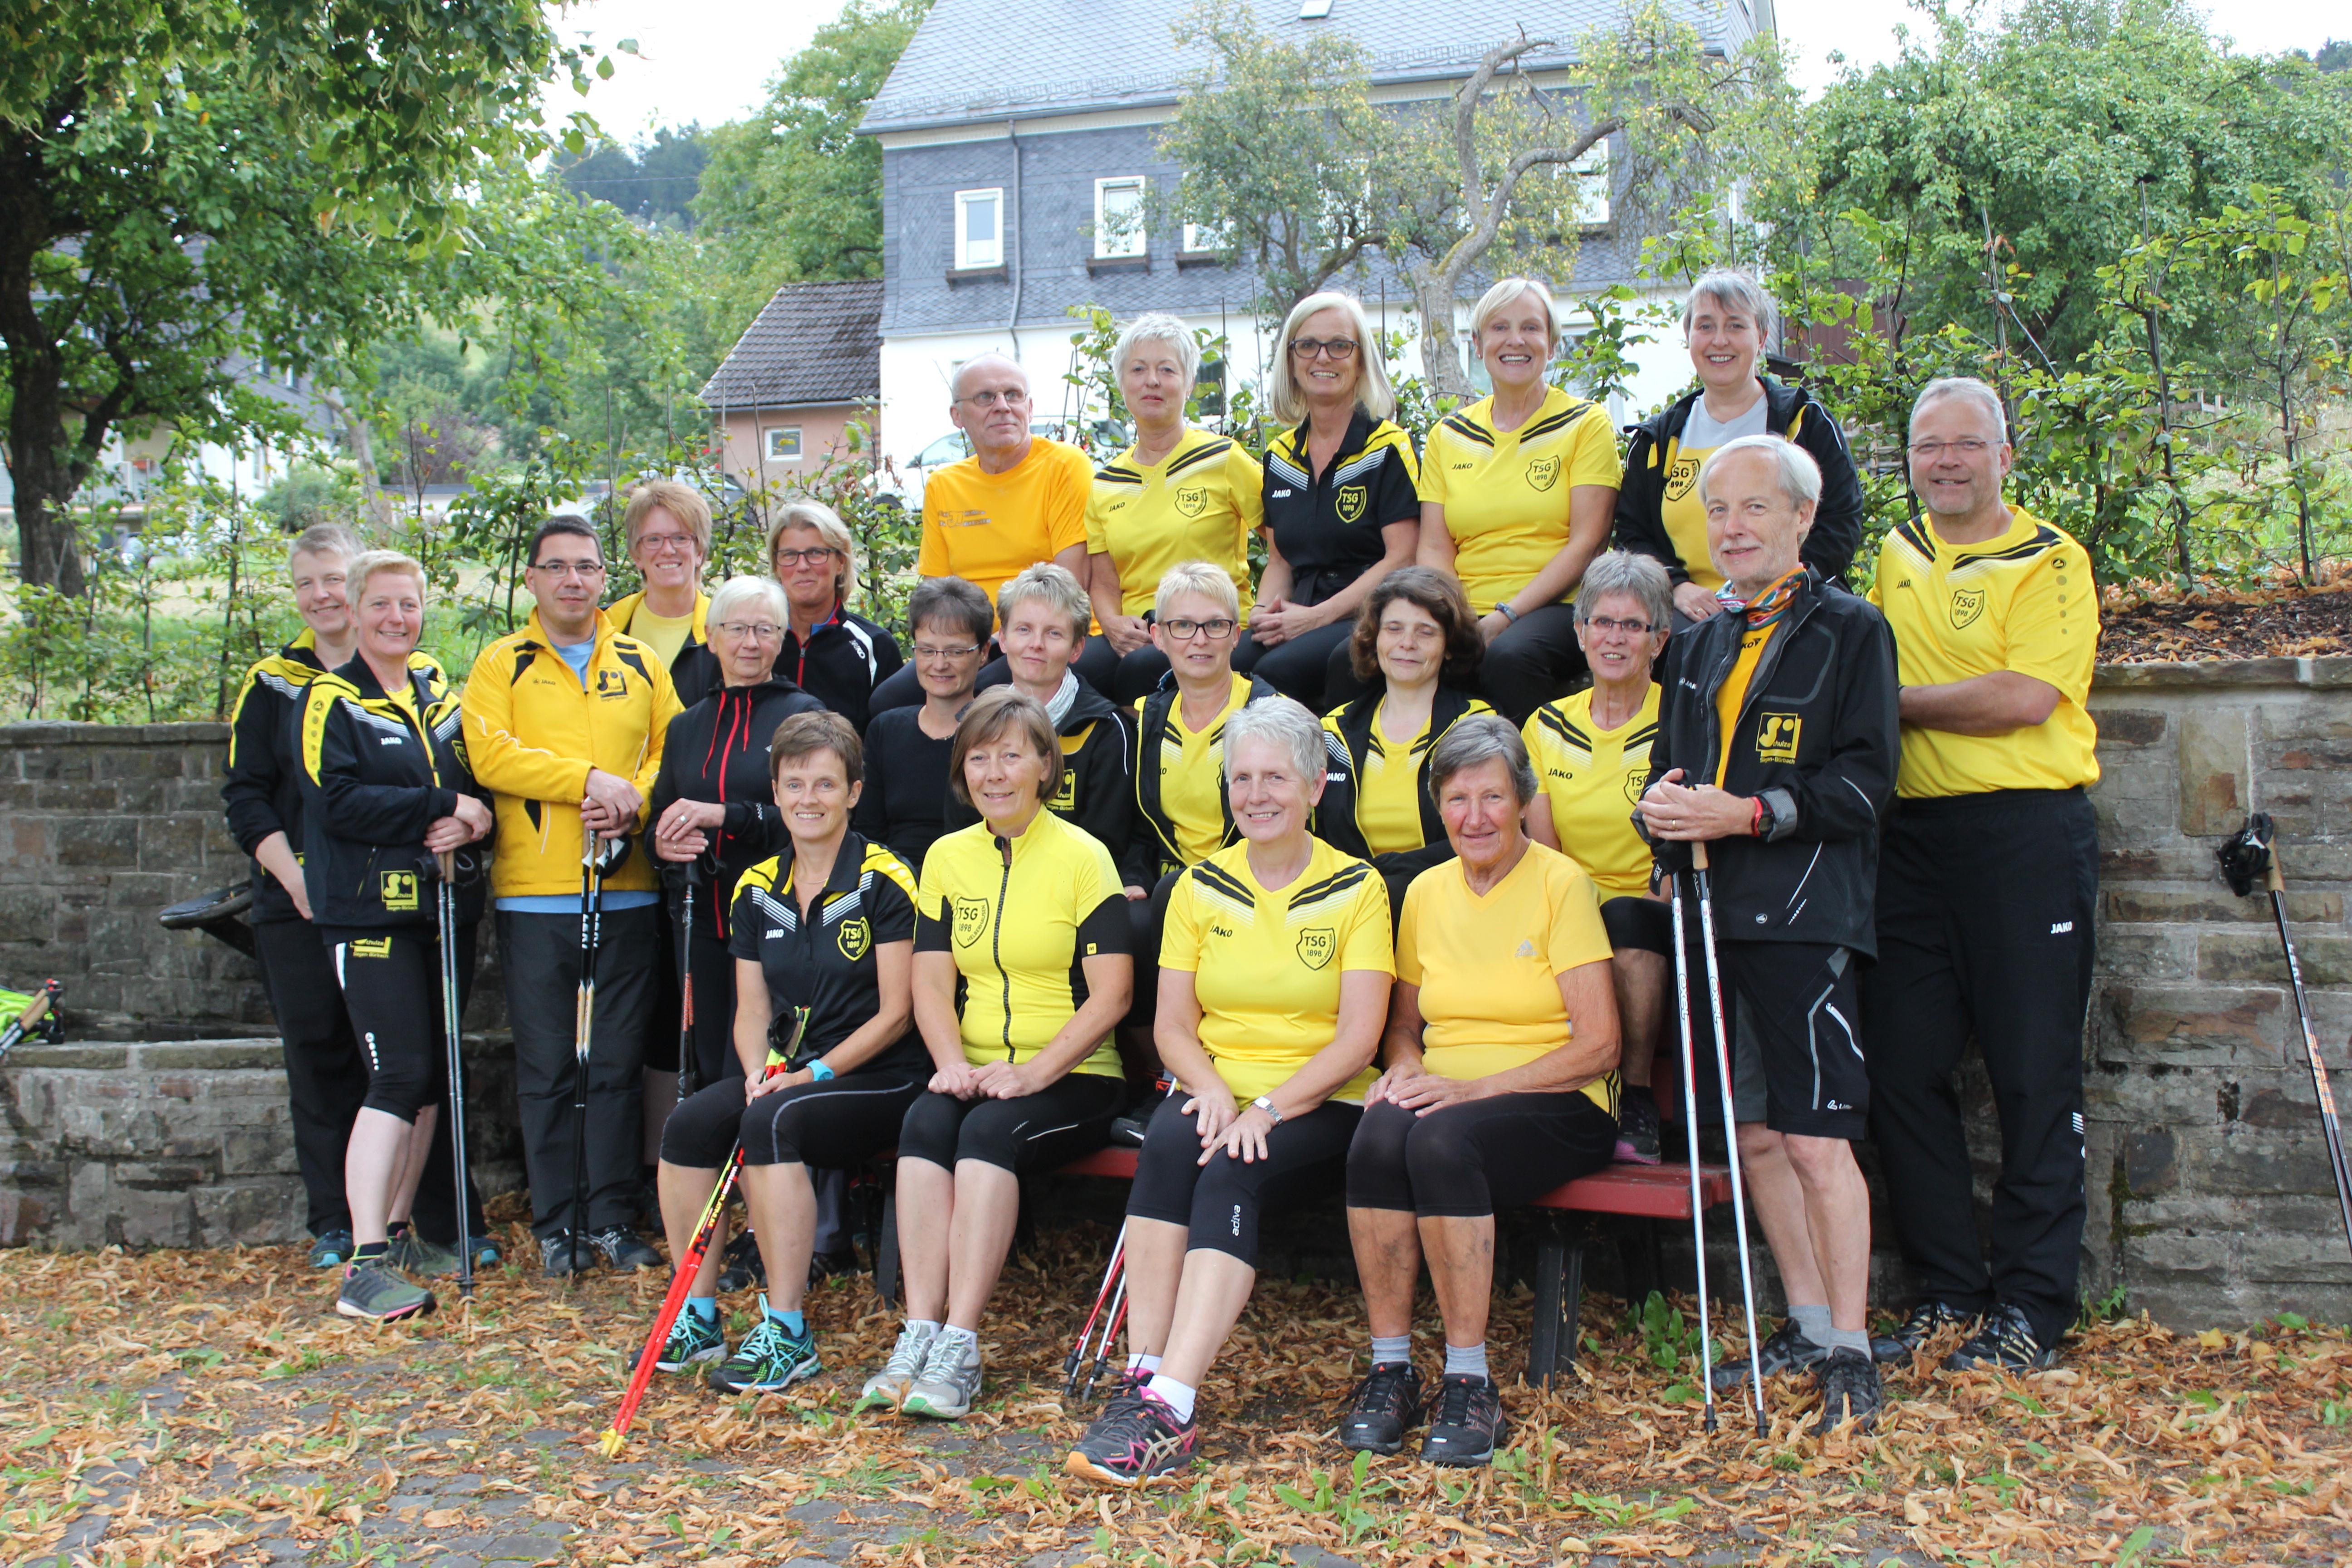 http://www.tsg-helberhausen.de/wp-content/uploads/2014/07/IMG_4429.jpg